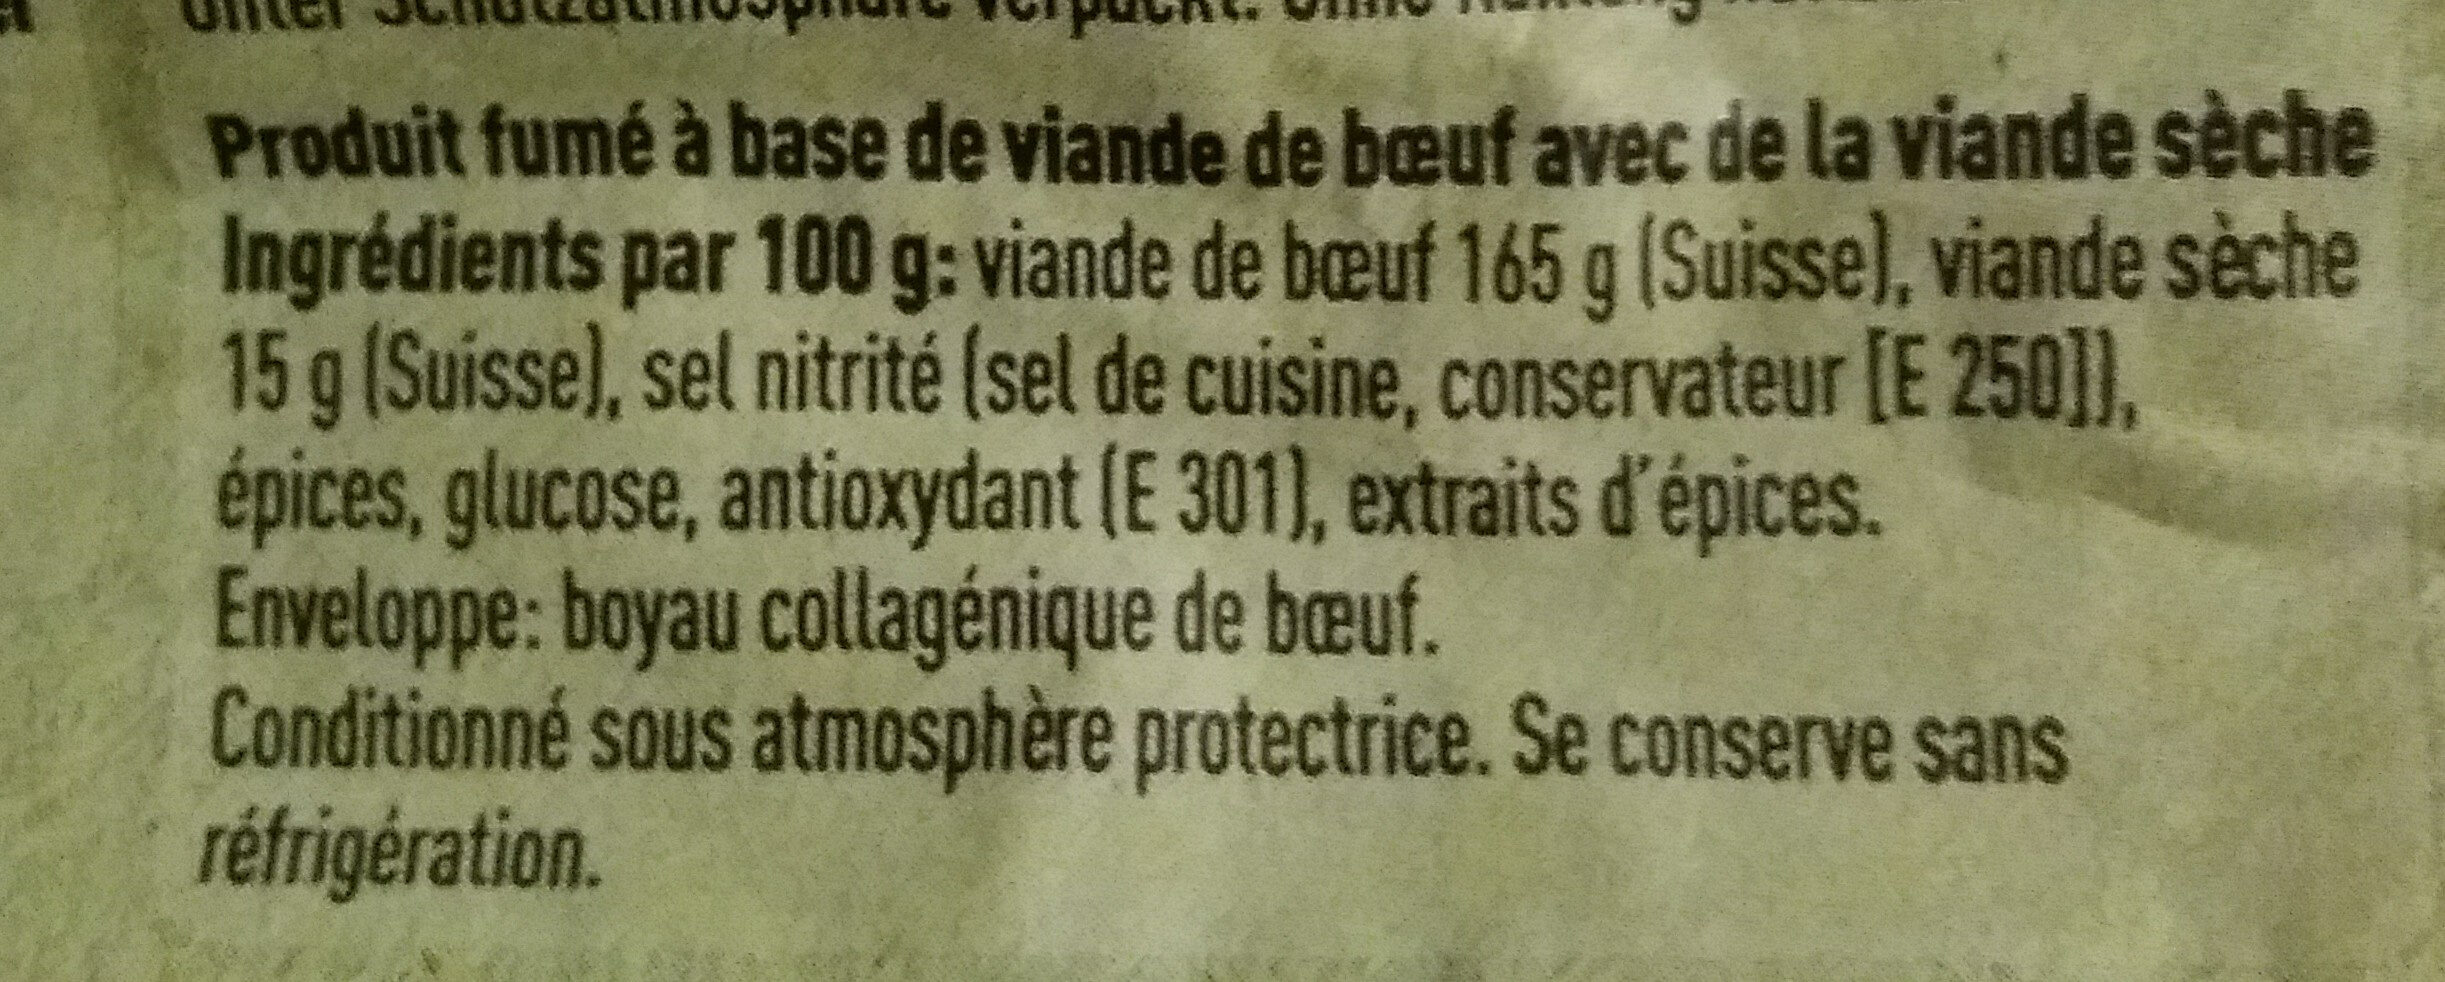 Bâtonnet de boeuf Angus - Ingredients - fr